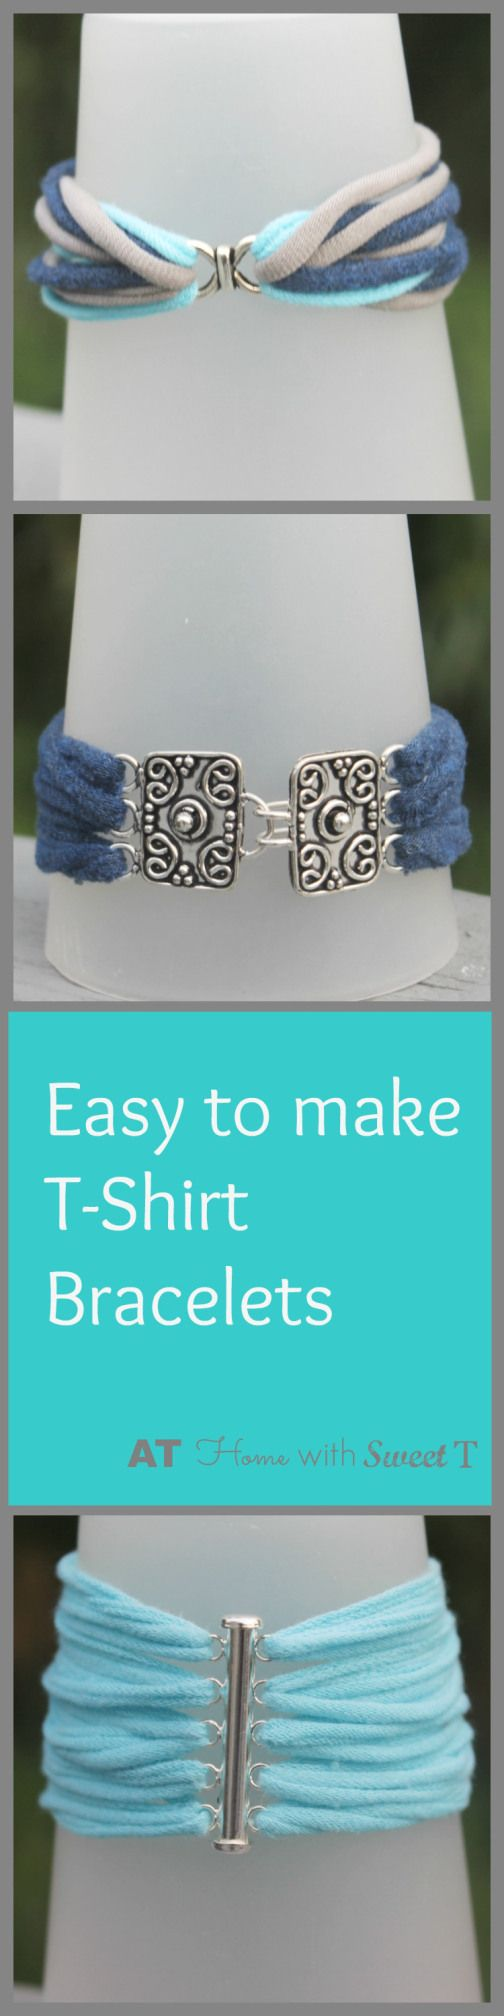 T-Shirt Bracelets Craft